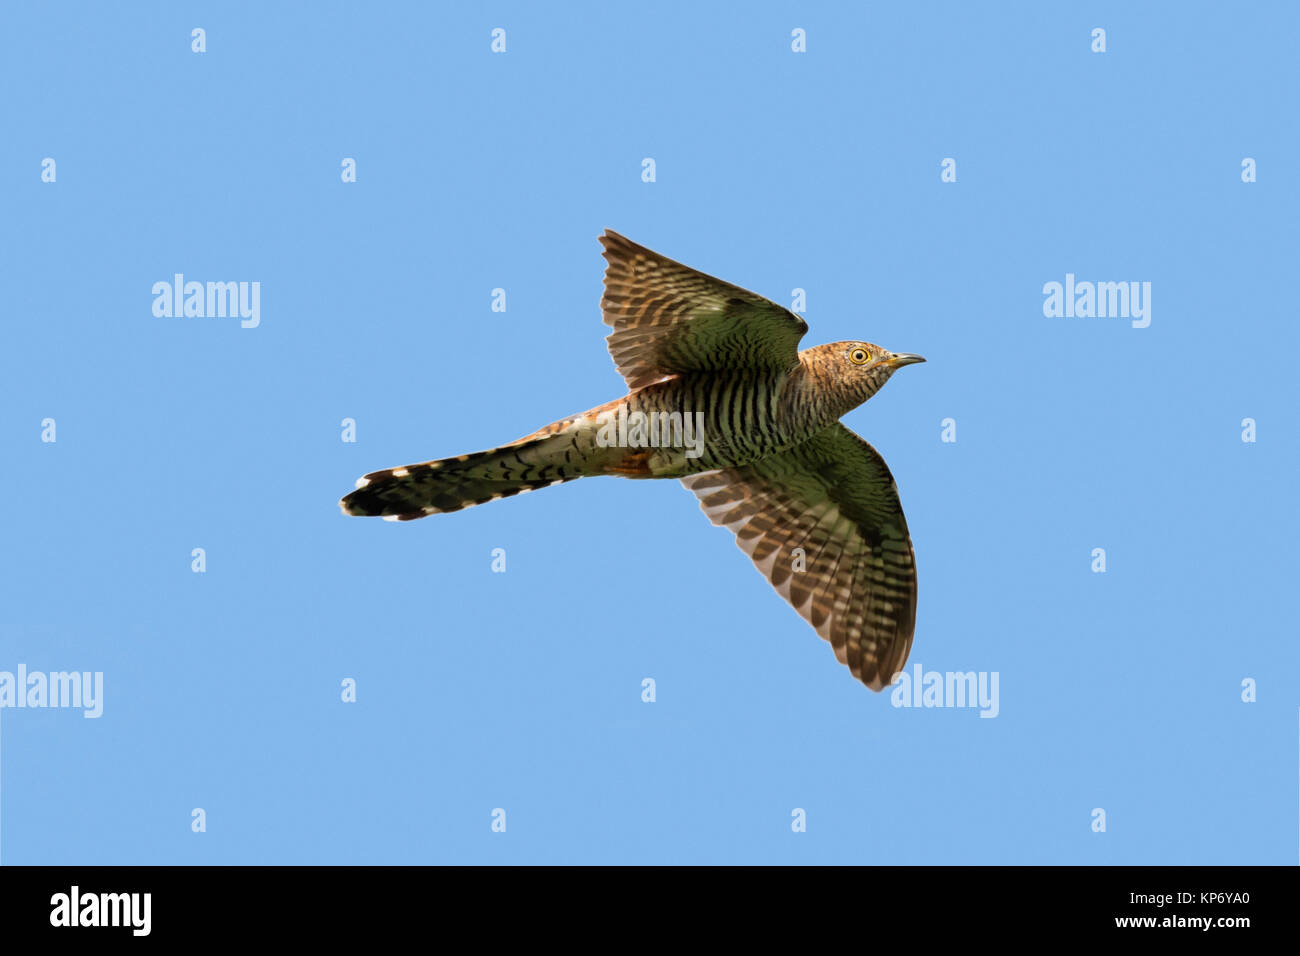 Common cuckoo (Cuculus canorus) female in flight against blue sky - Stock Image